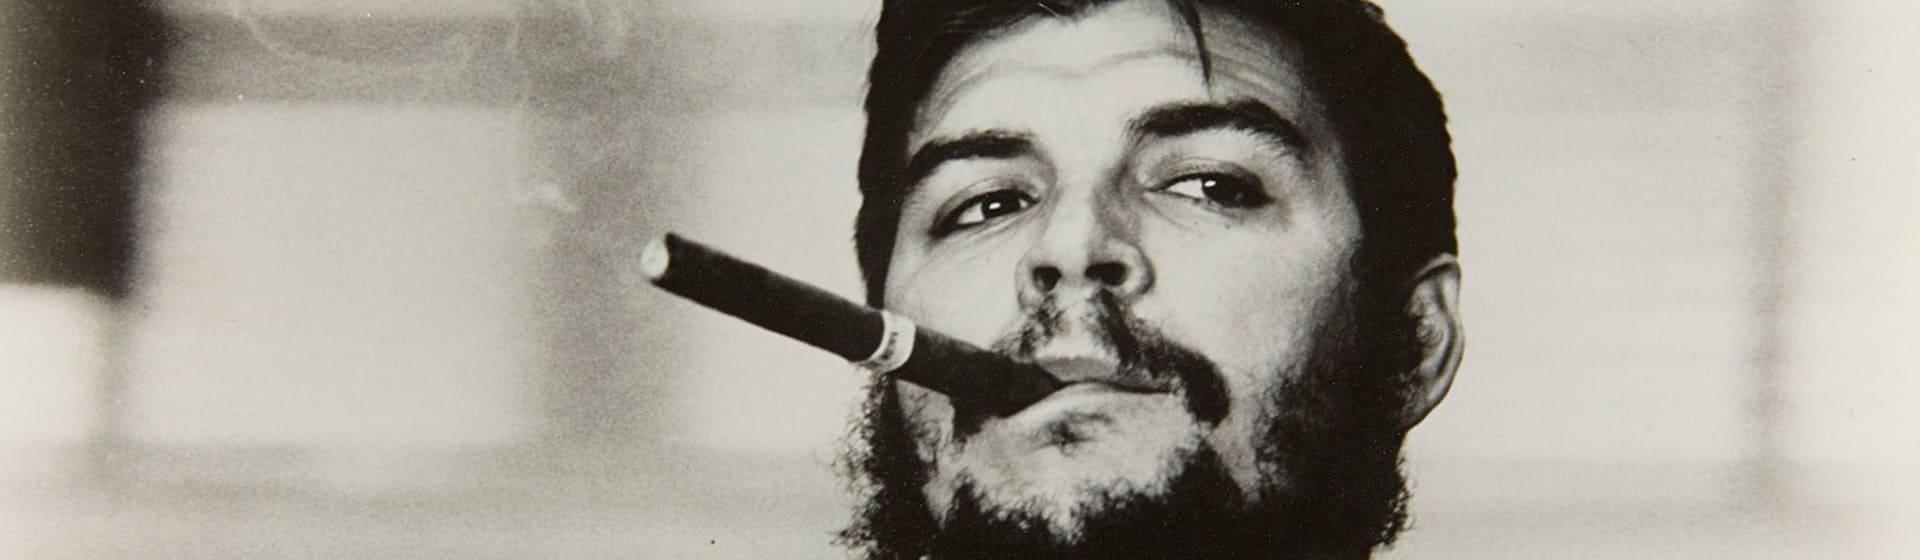 Че Гевара - Мерч и одежда с атрибутикой